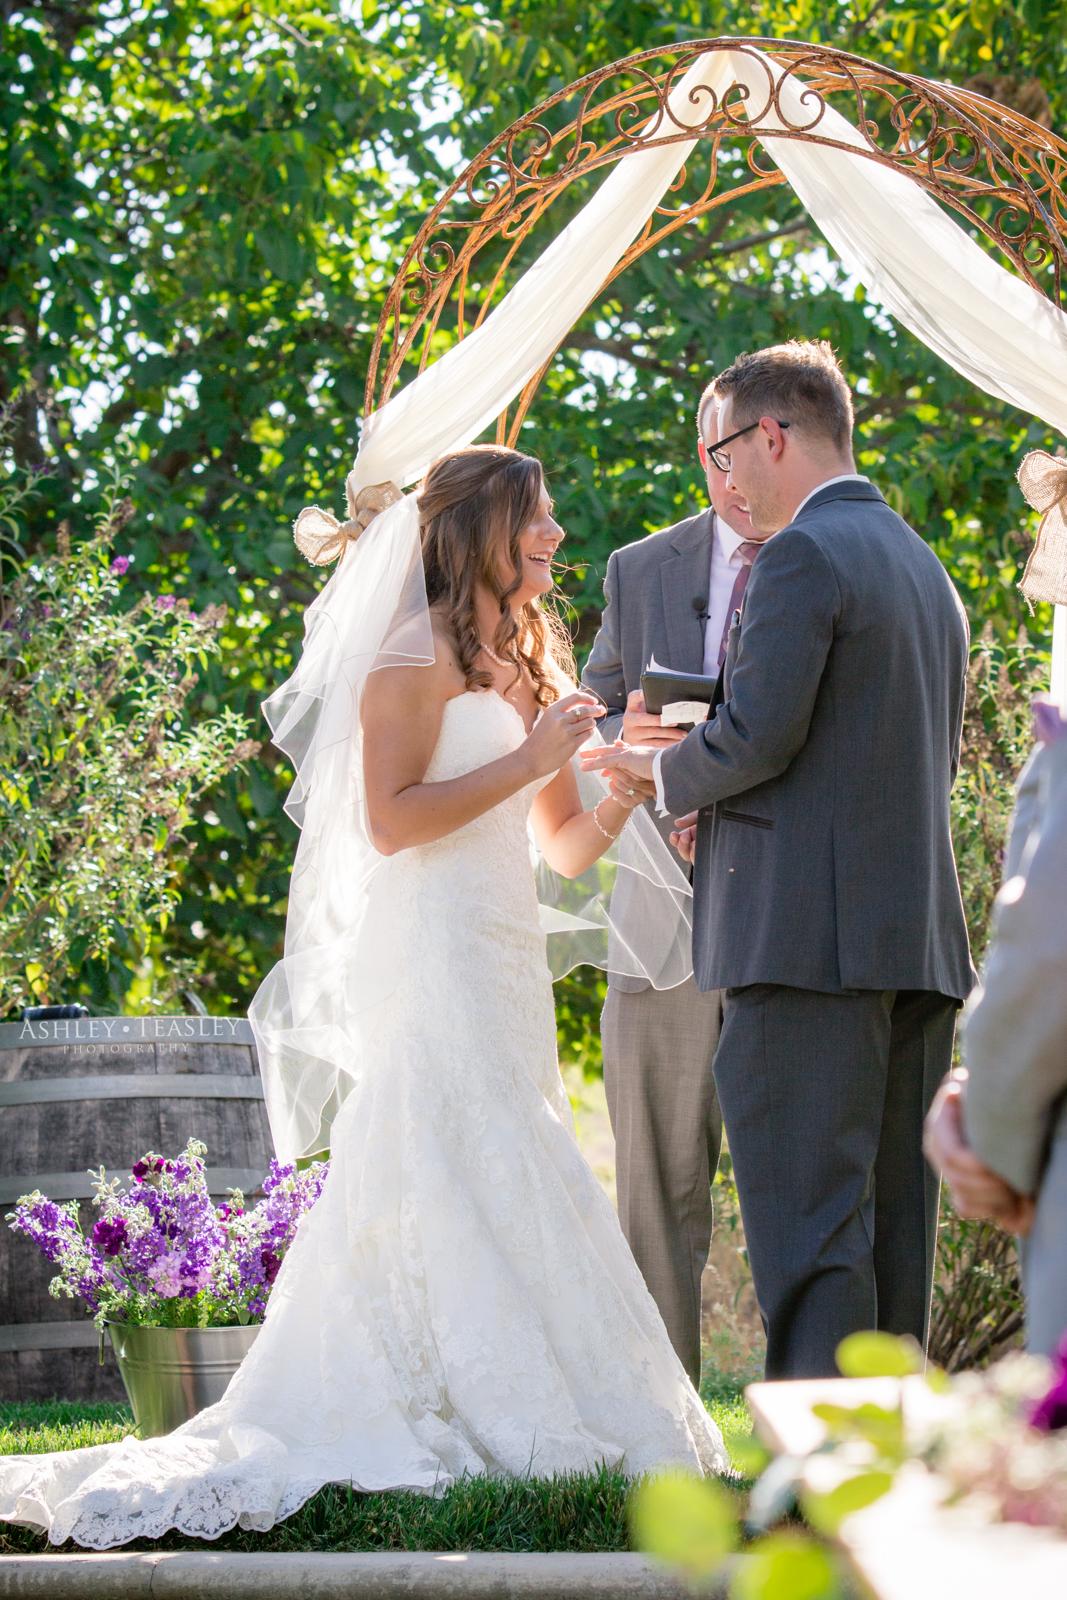 Ashley Teasley Photography - Amador Cellars Winery - Sacramento Wedding Photographer-116.JPG